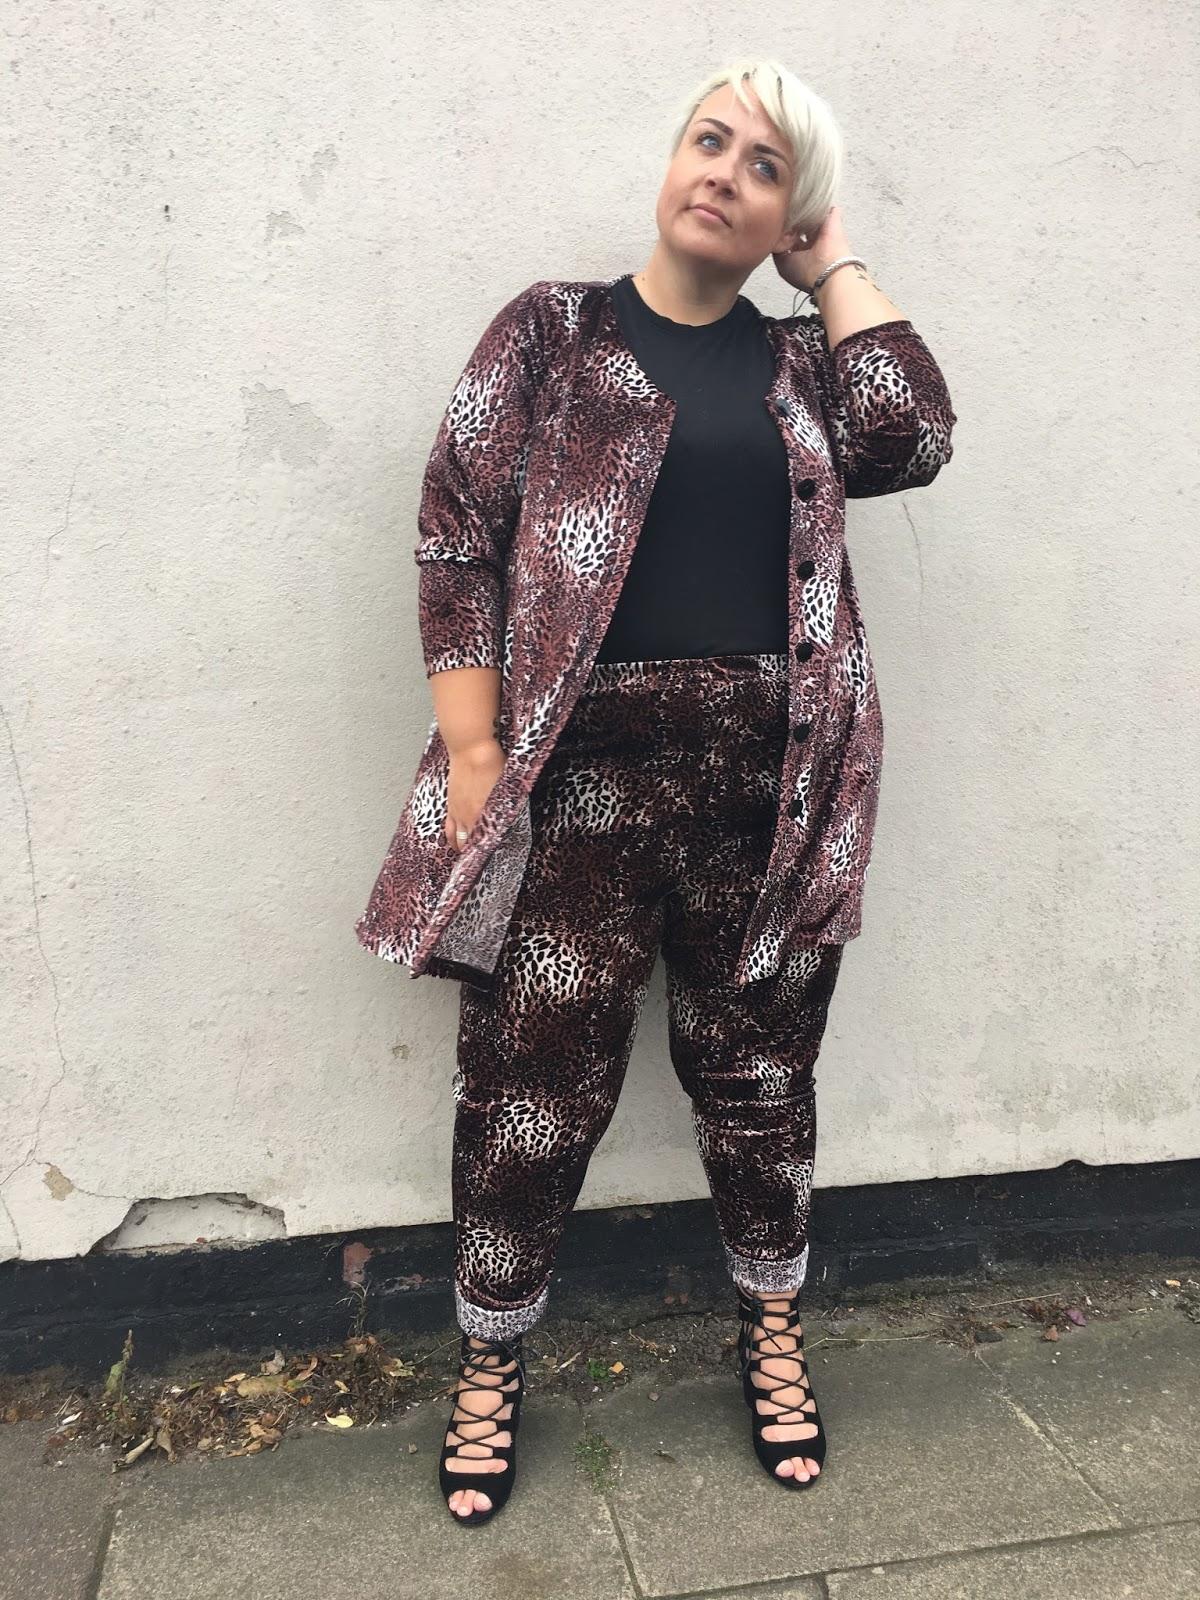 5cd4f8895c2f7 Style  Sixteen47 - Leopard Lovely - Becky Barnes Blog